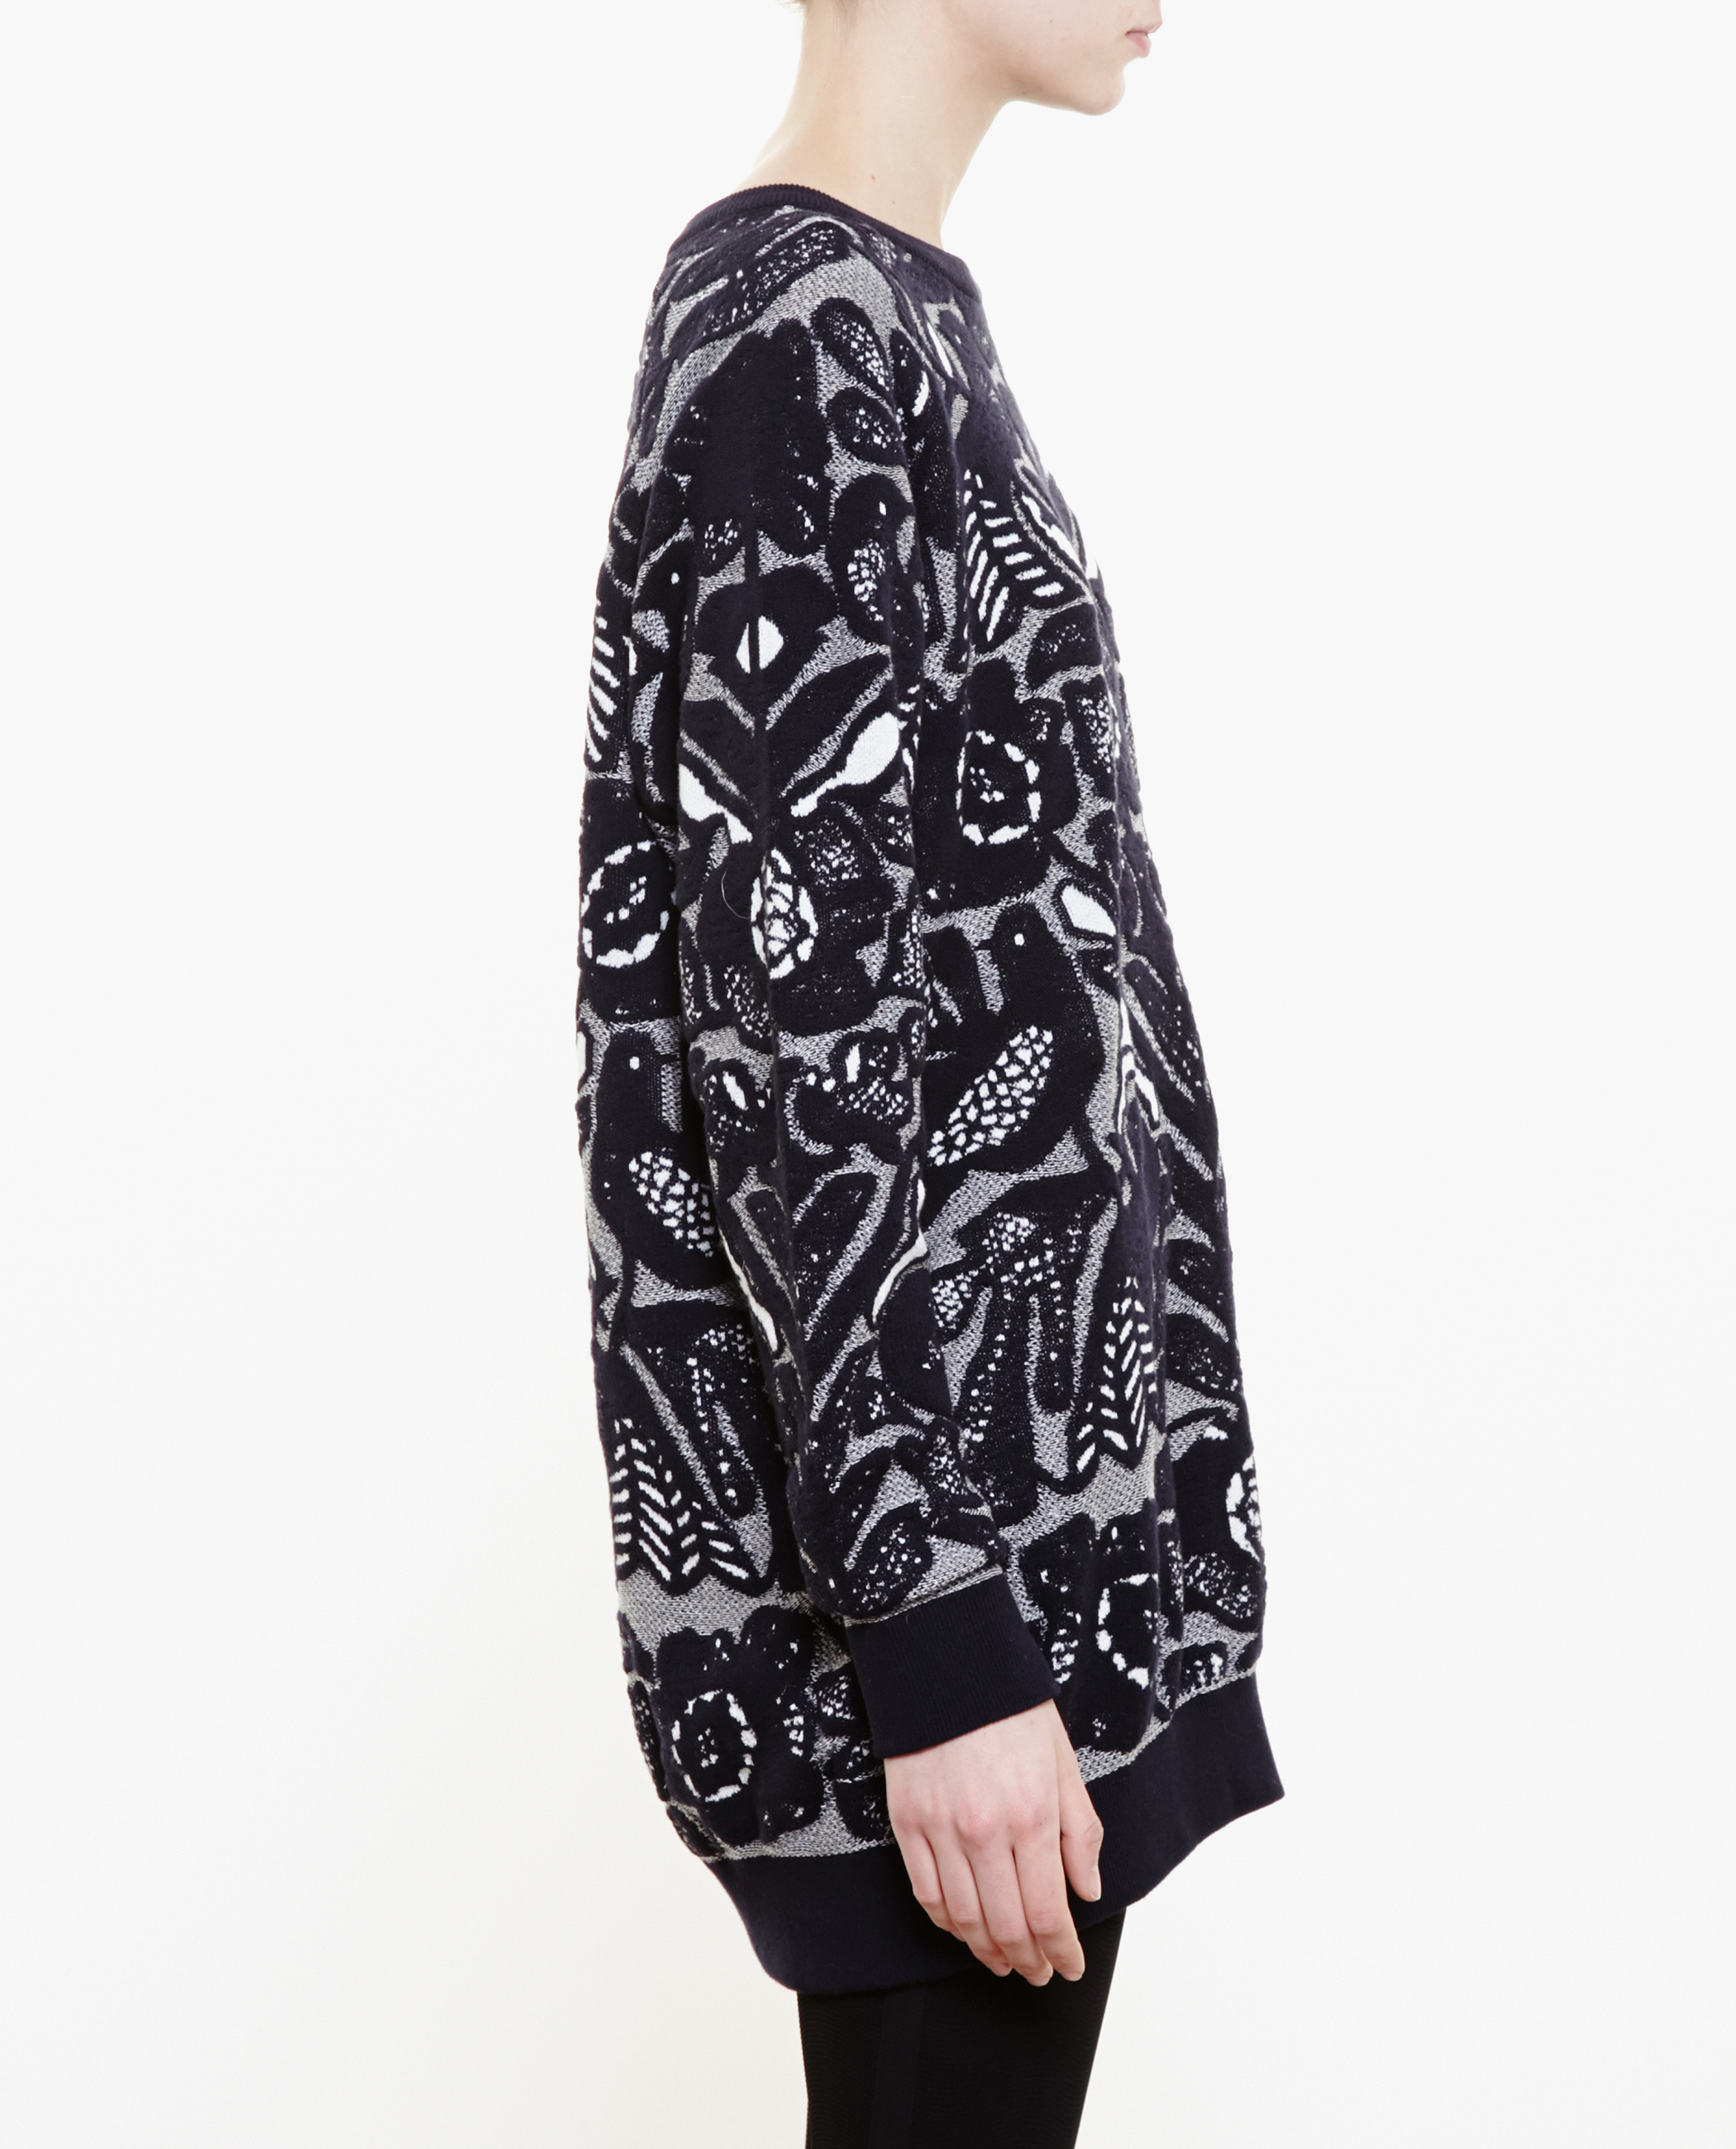 Chloé Flower Jacquard Sweater in Black